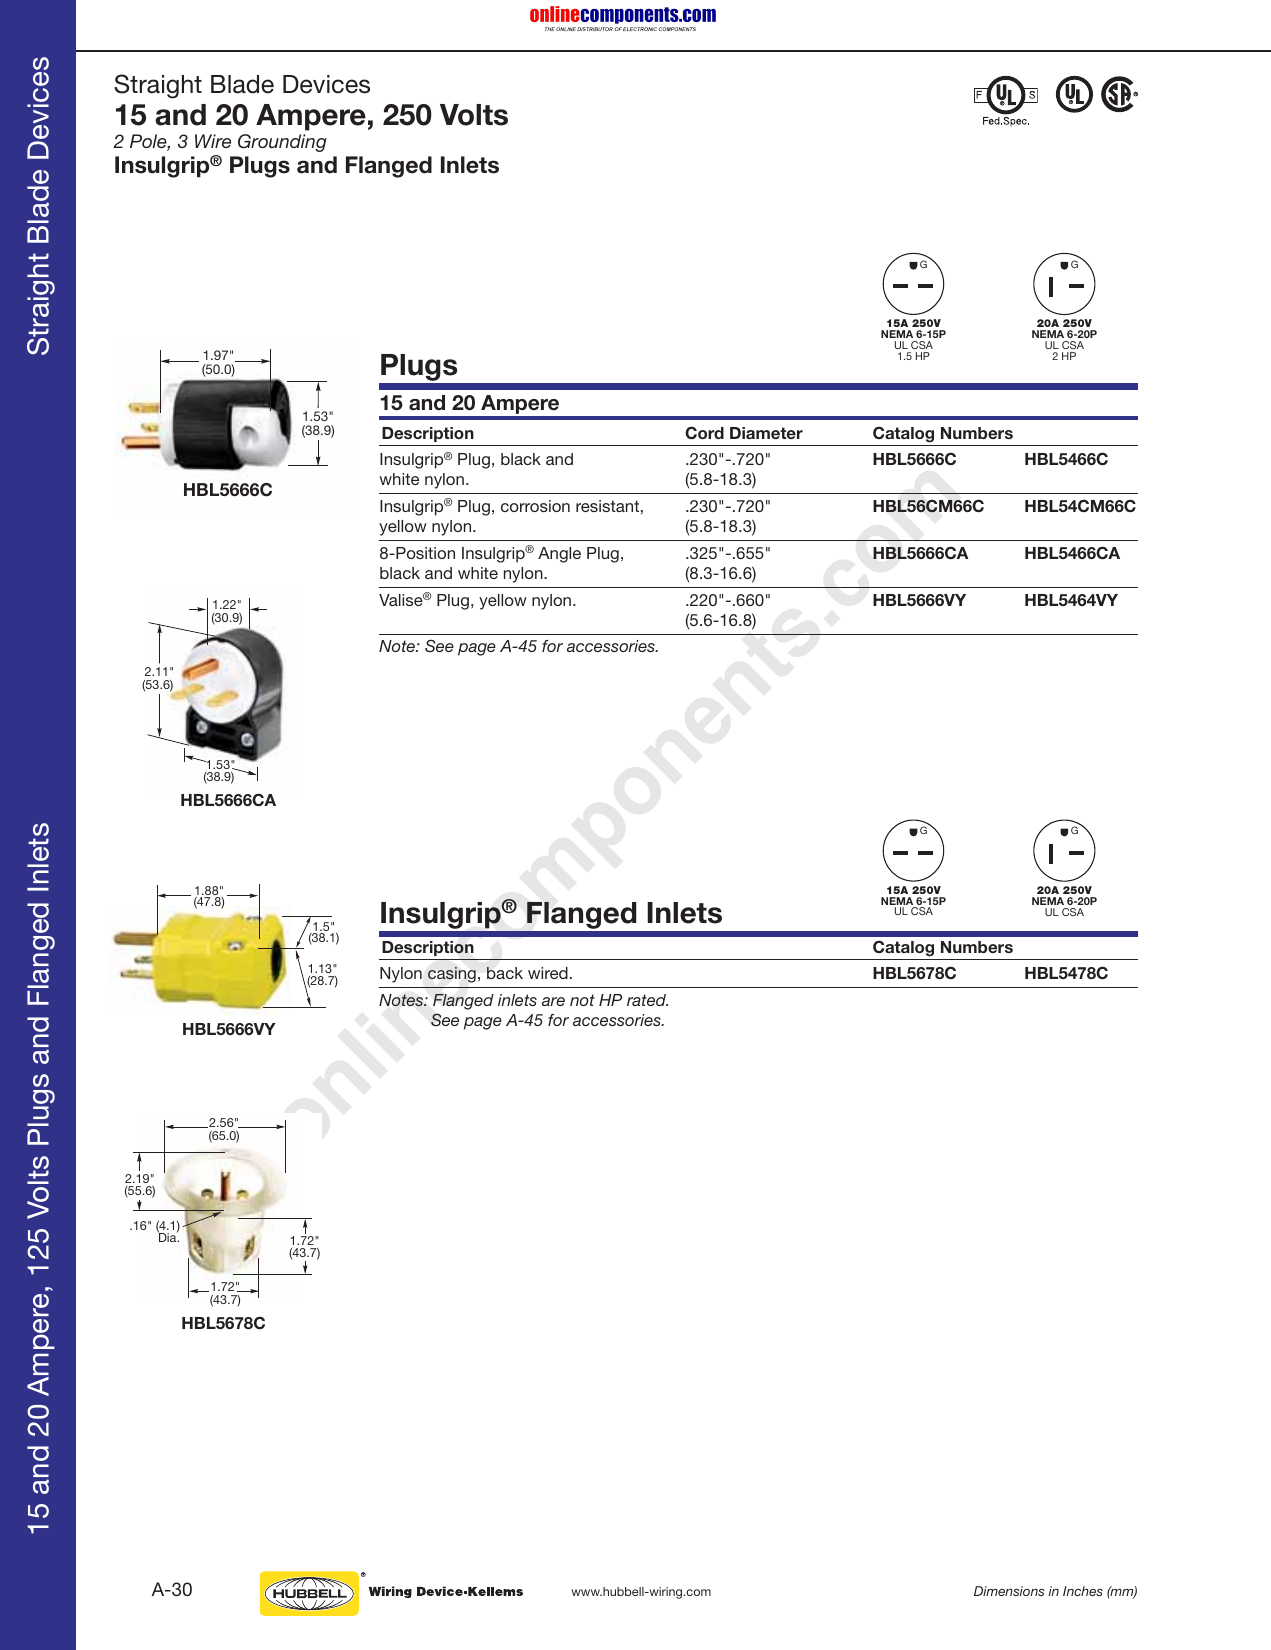 30 Ampere250 Volt Nema L630r Flanged Panel Mount Power Outlet 2p